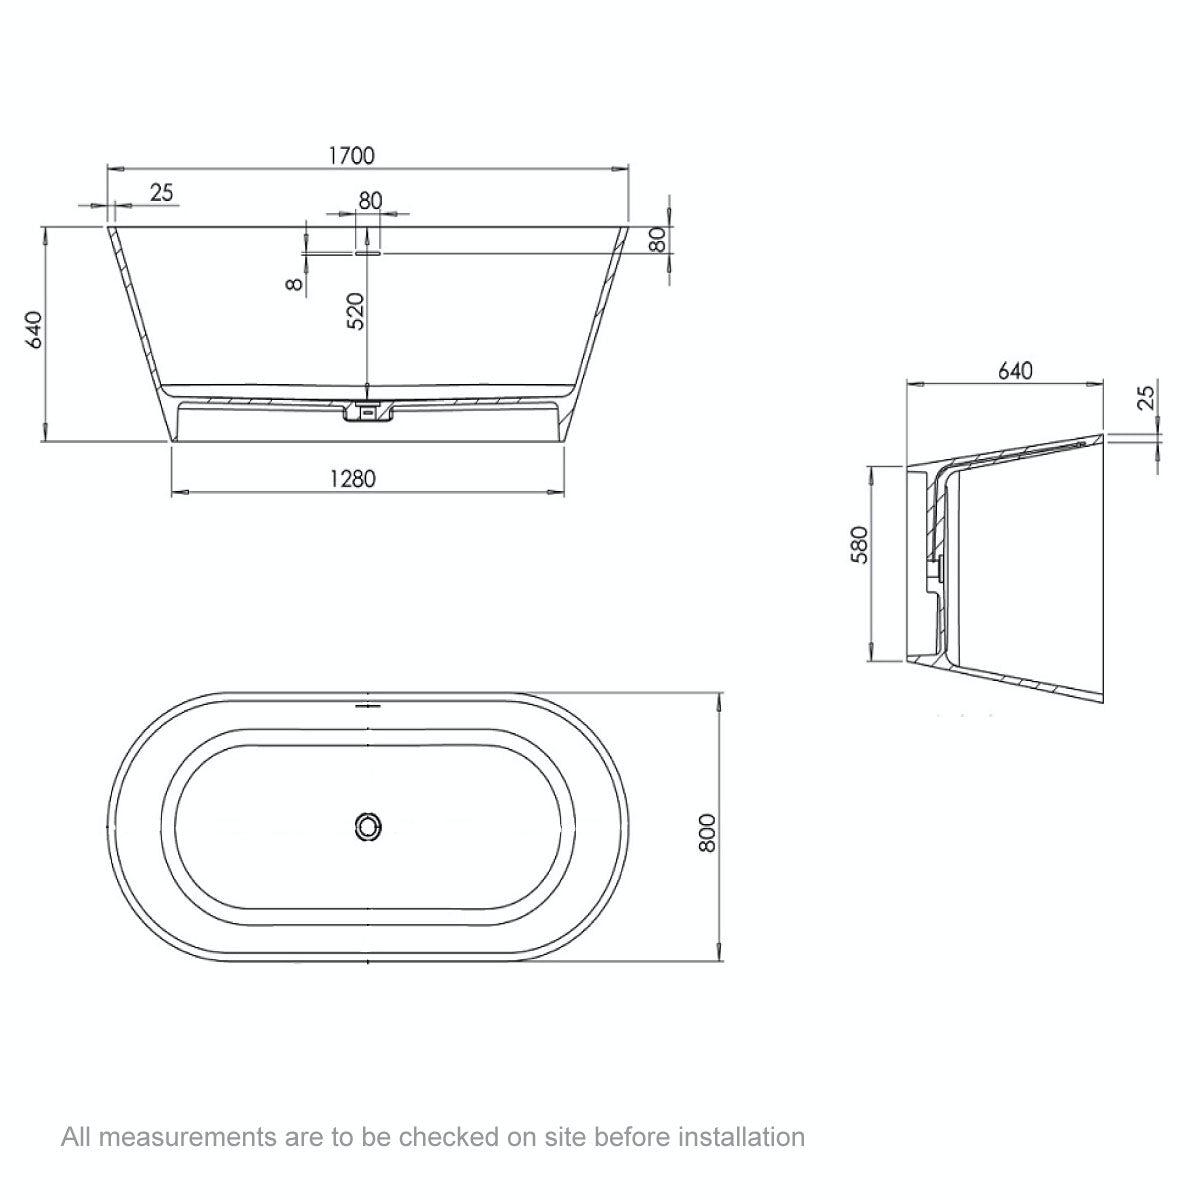 Dimensions for Belle de Louvain Goda solid surface stone resin freestanding bath